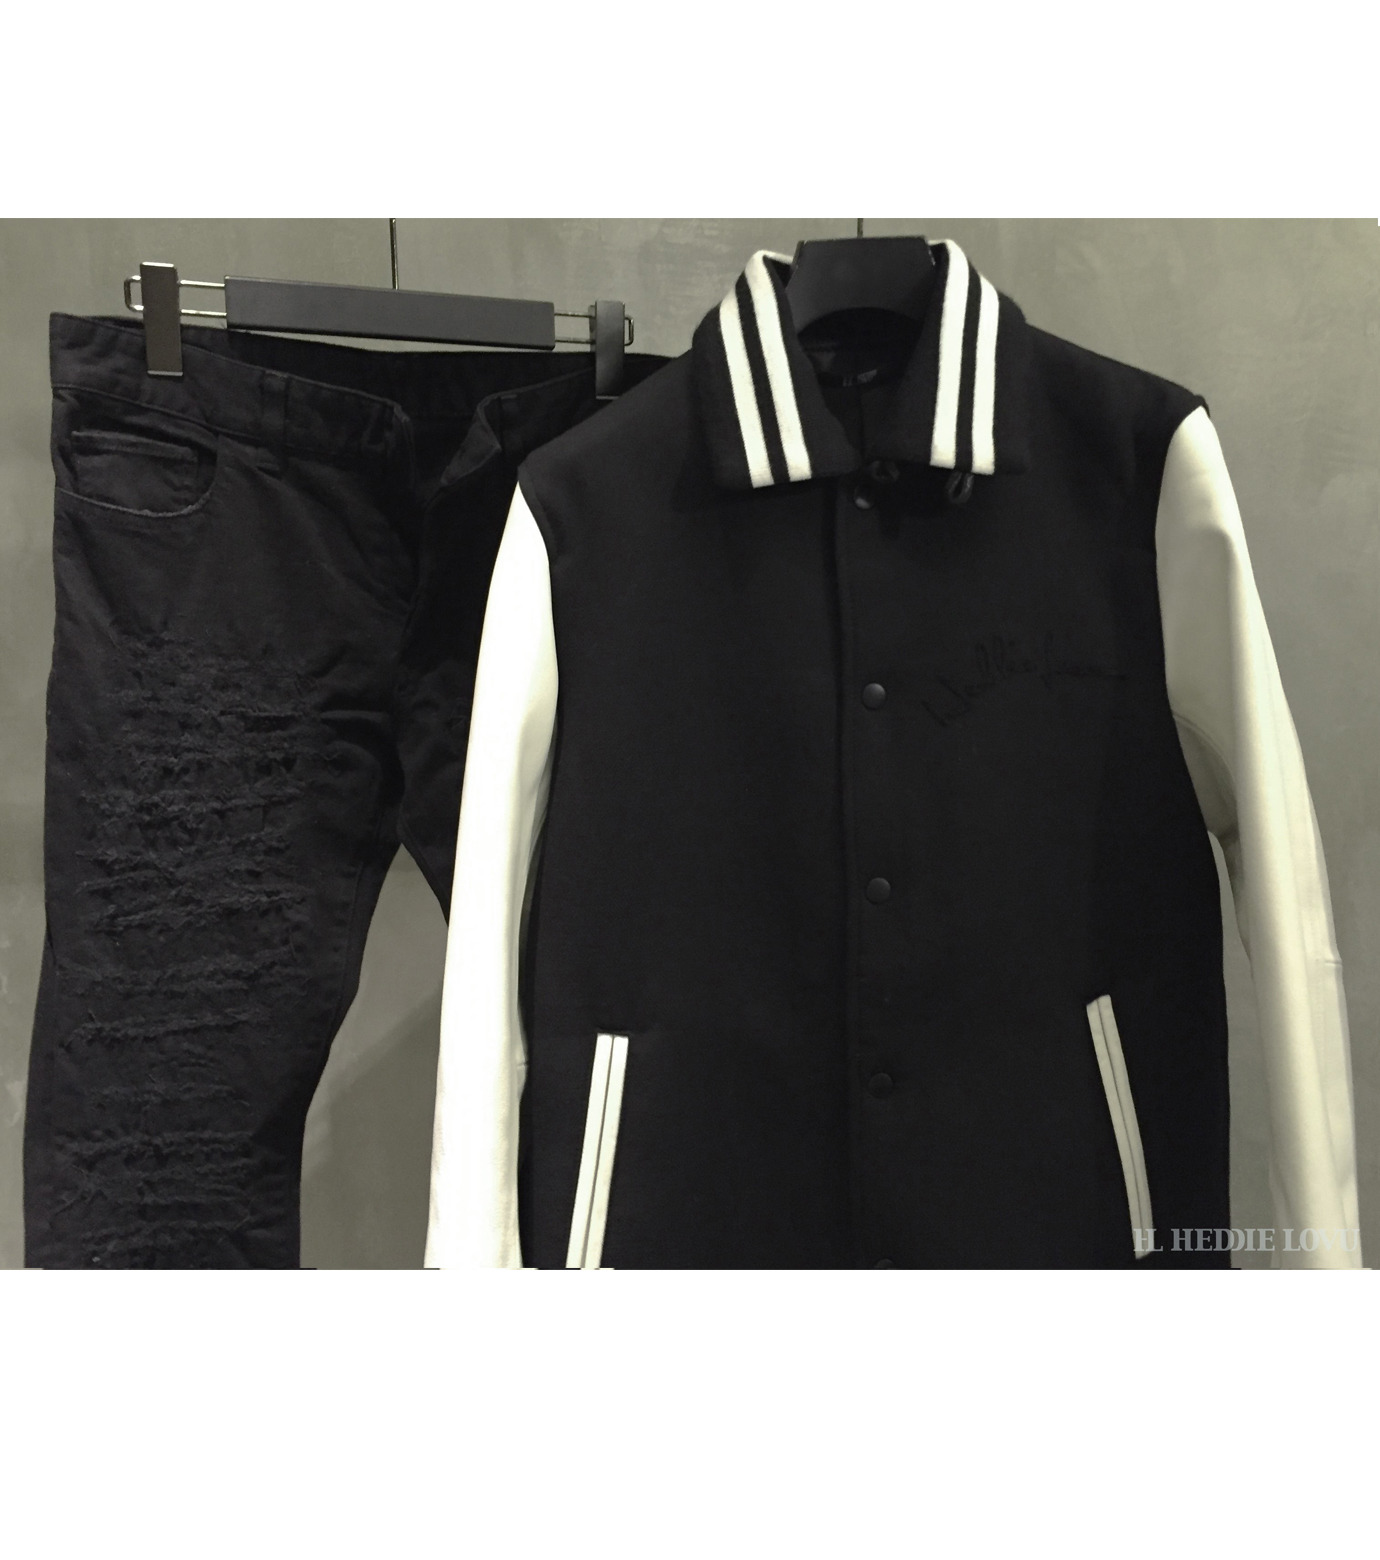 HL HEDDIE LOVU(エイチエル・エディールーヴ)のLONG STADIUM JAC-WHITE(ジャケット/jacket)-18S99002-4 拡大詳細画像5